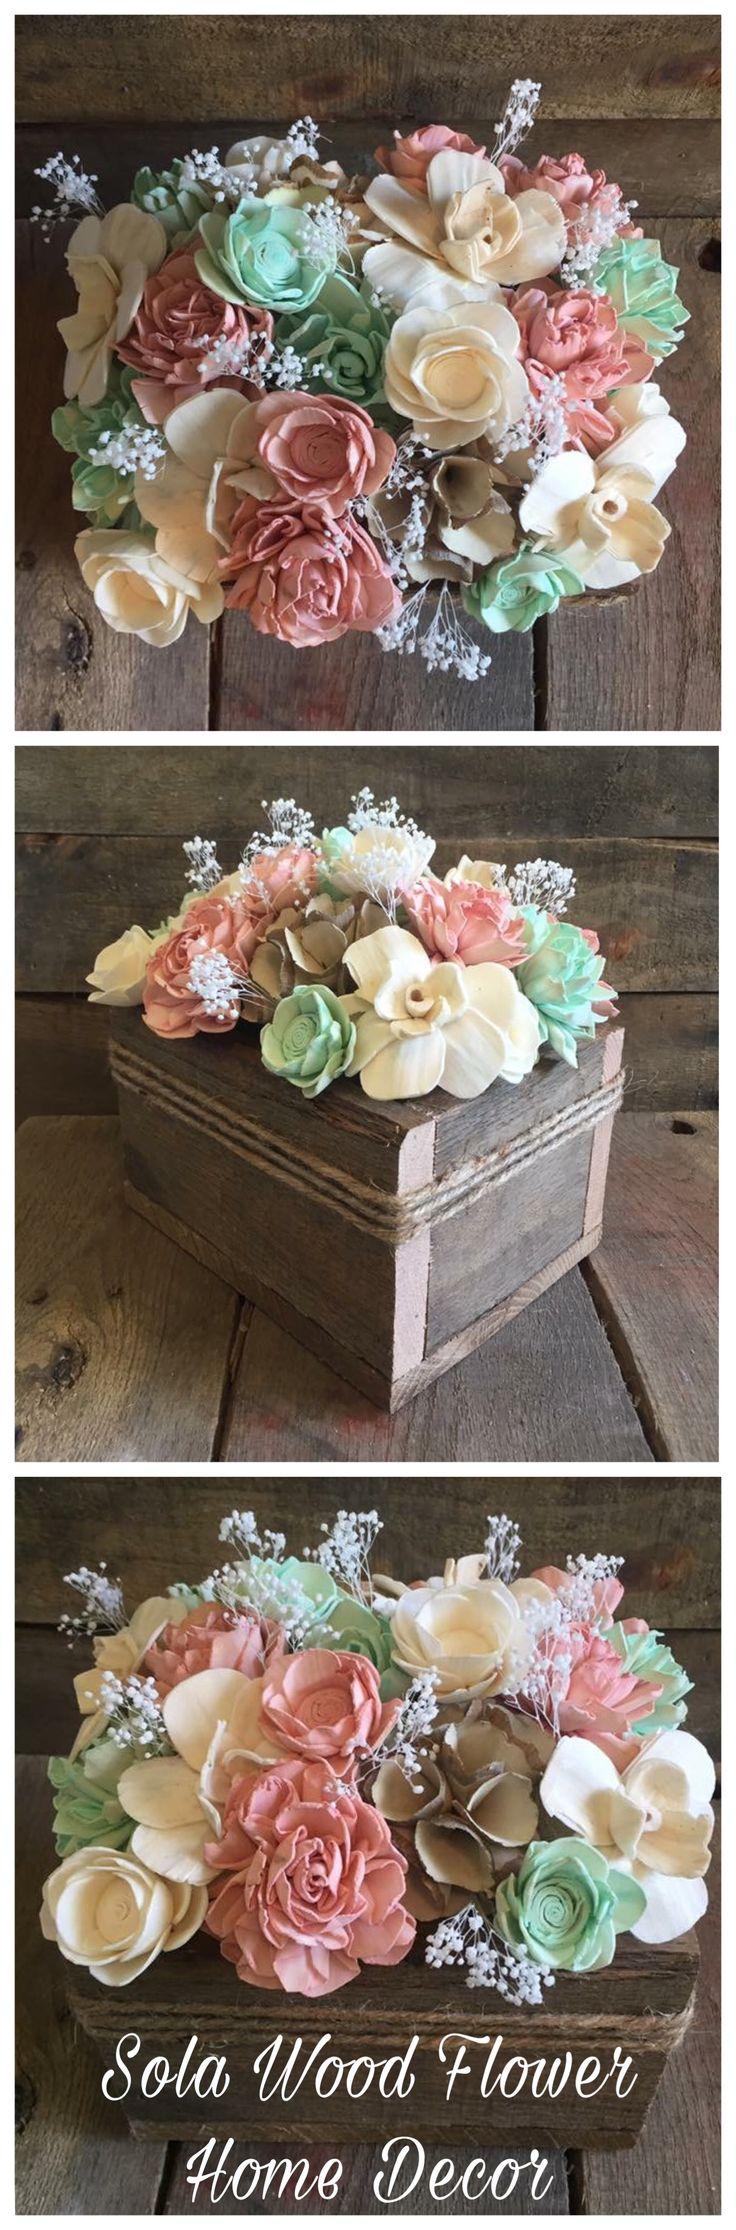 166 best wedding ideas bridal party flowers images on pinterest 5838c83c37d9eda386d66f0166f836cbg izmirmasajfo